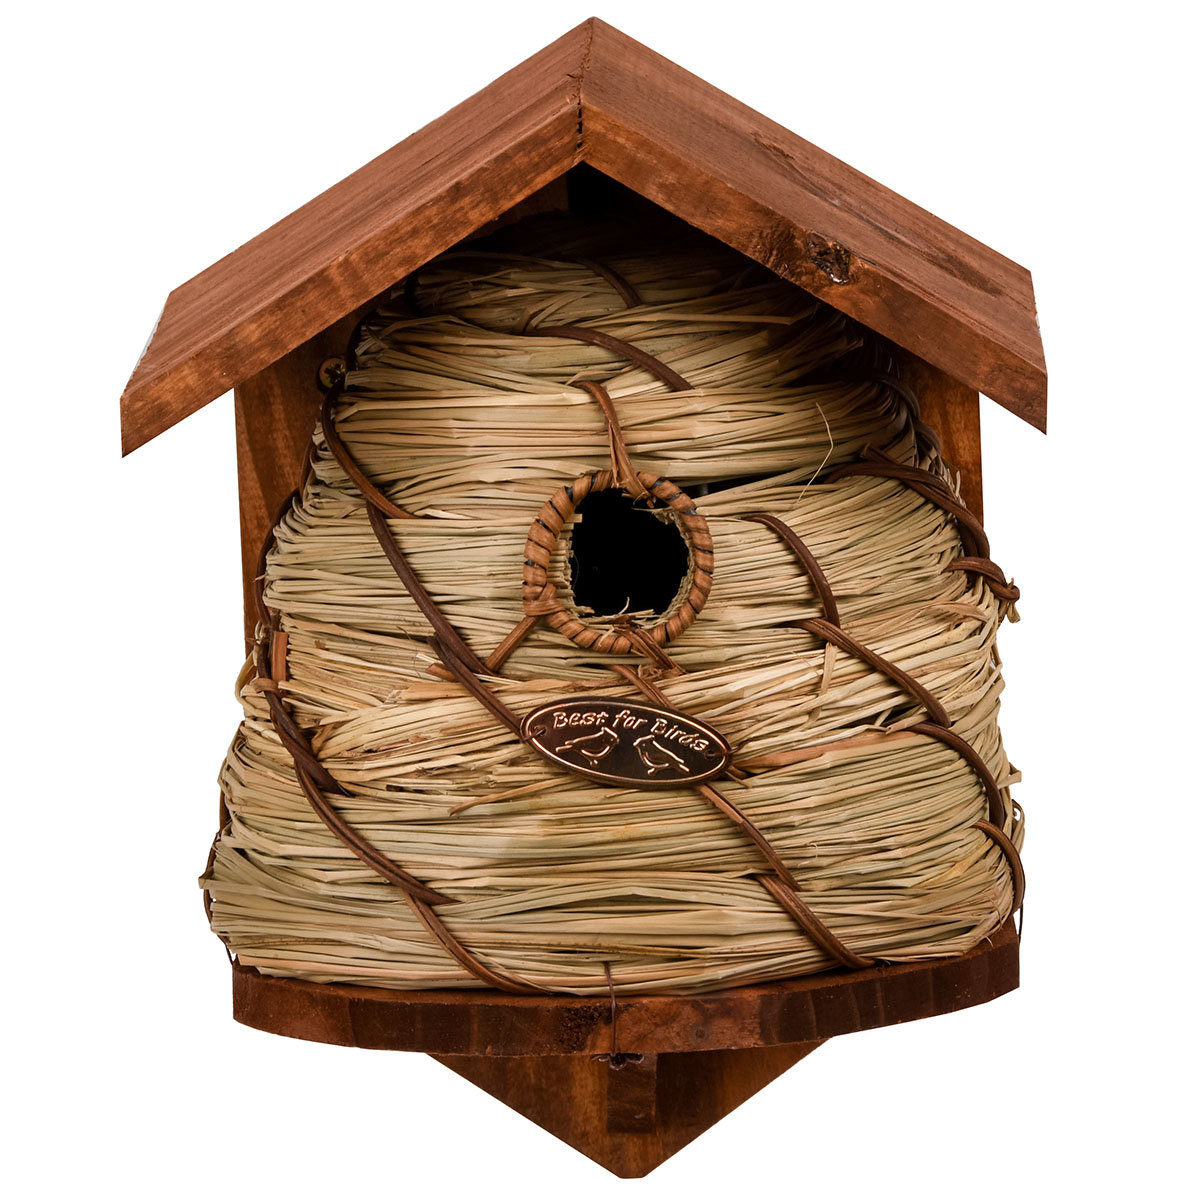 Nistkasten im Bienenkorbdesign, Kiefernholz, ca. 19 x 20 x 25 cm